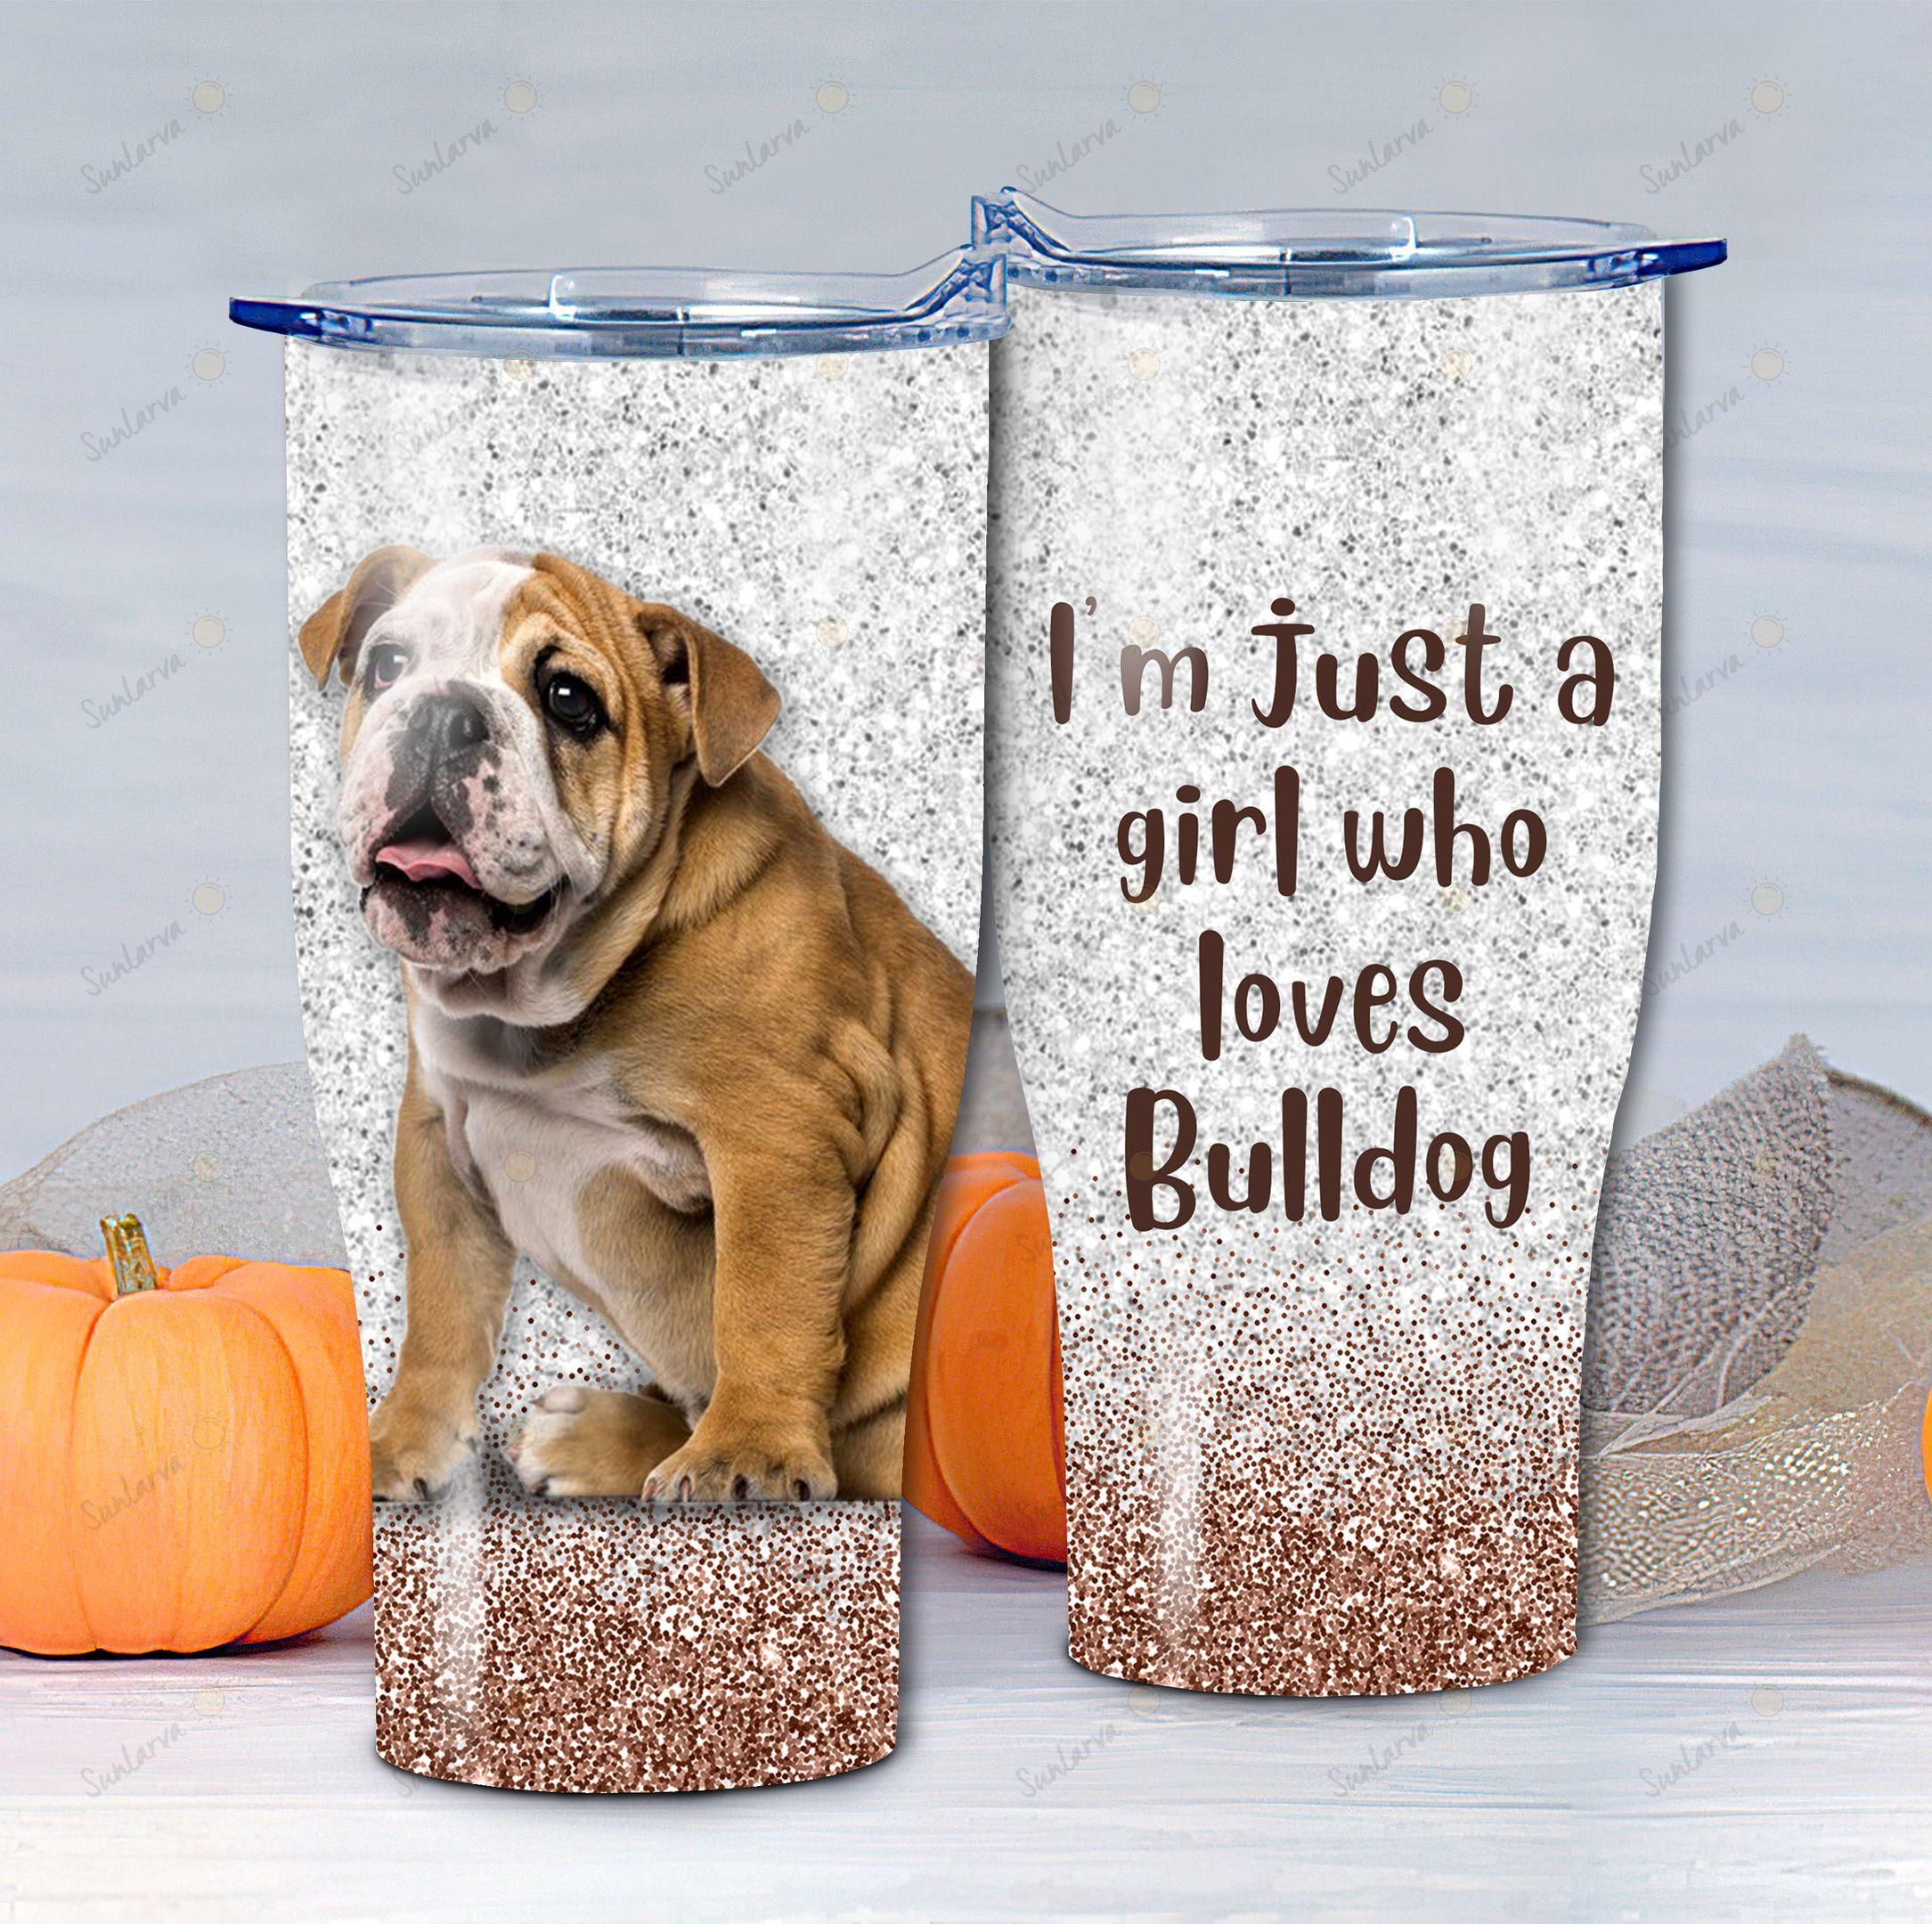 Daso Bulldog loves-PT010054Fa